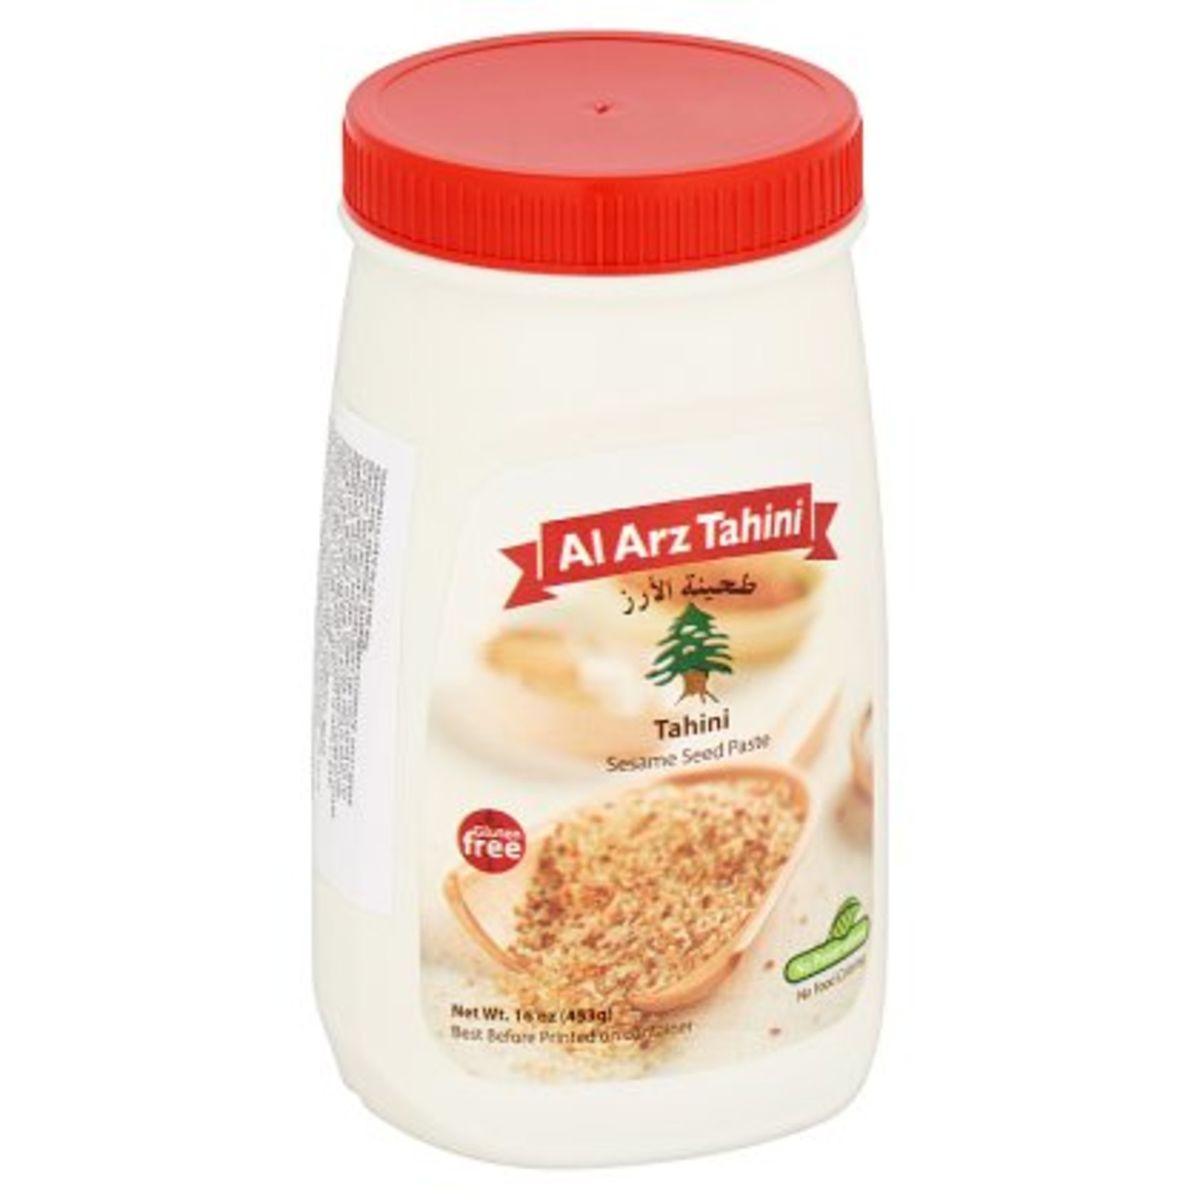 Al Arz Tahini Sesame Seed Paste 453 g